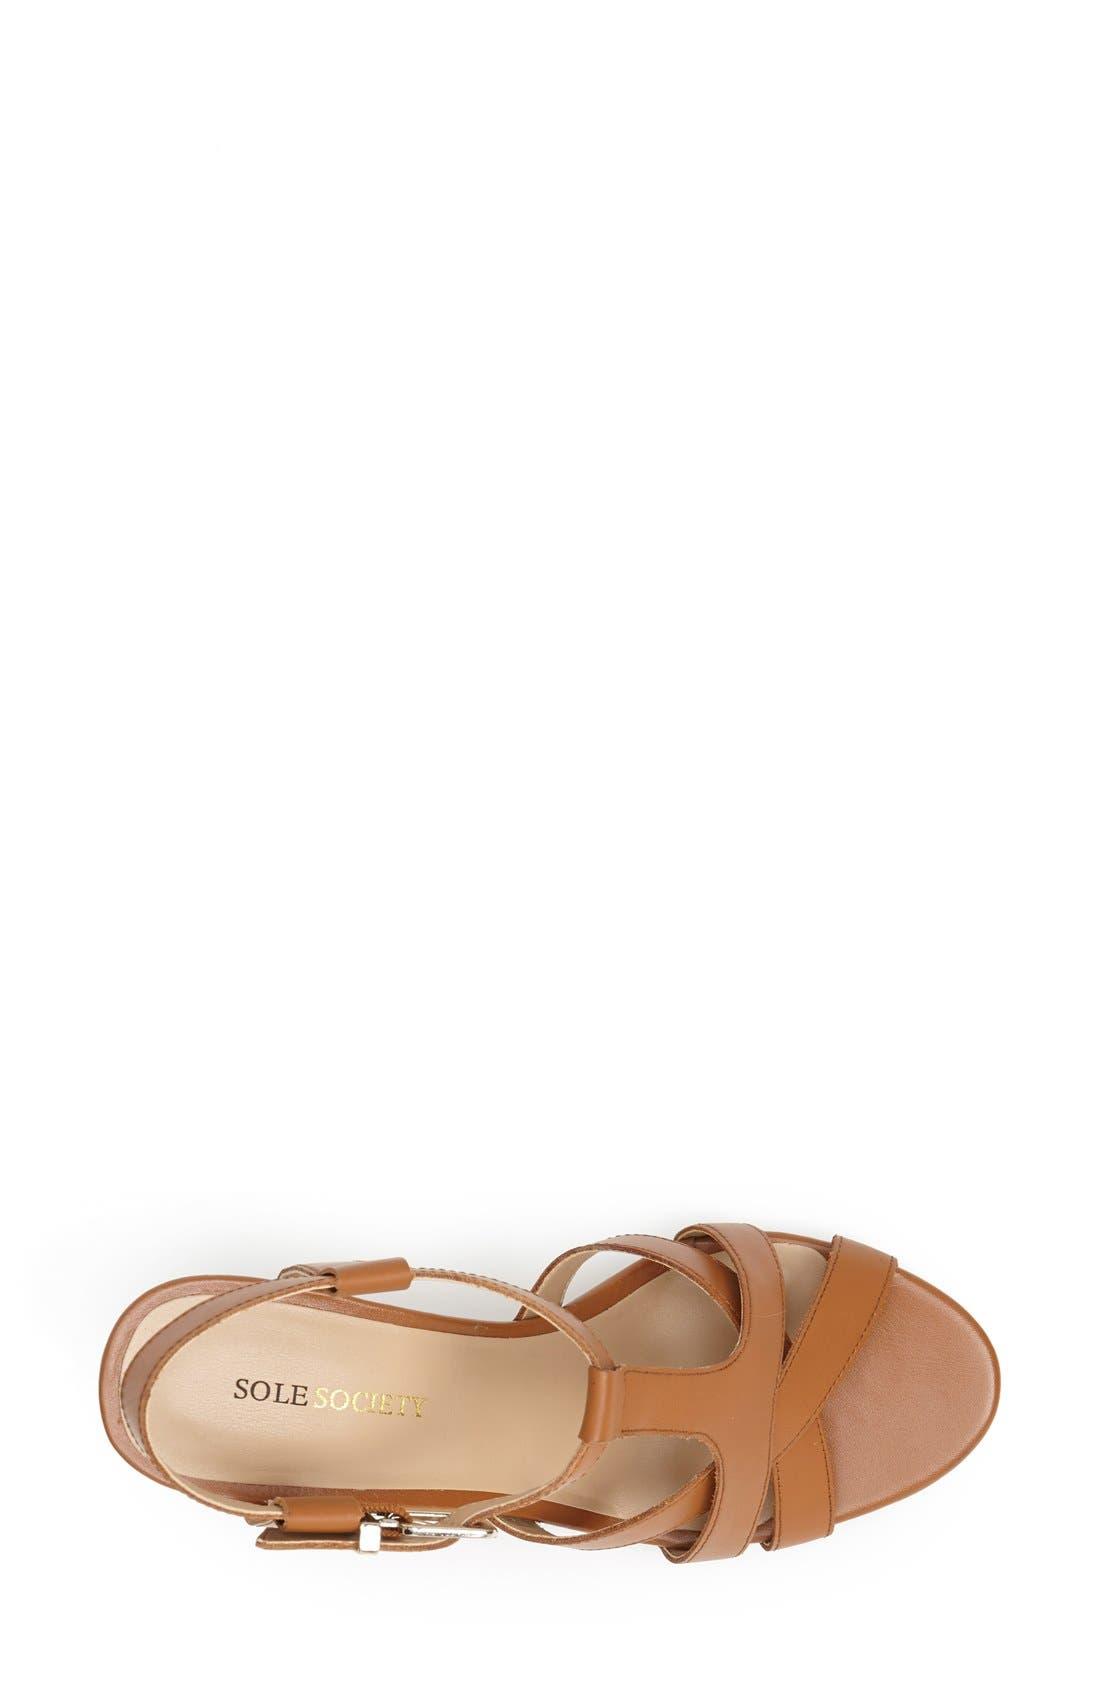 Alternate Image 3  - Sole Society 'Metsey' Wedge Sandal (Women)